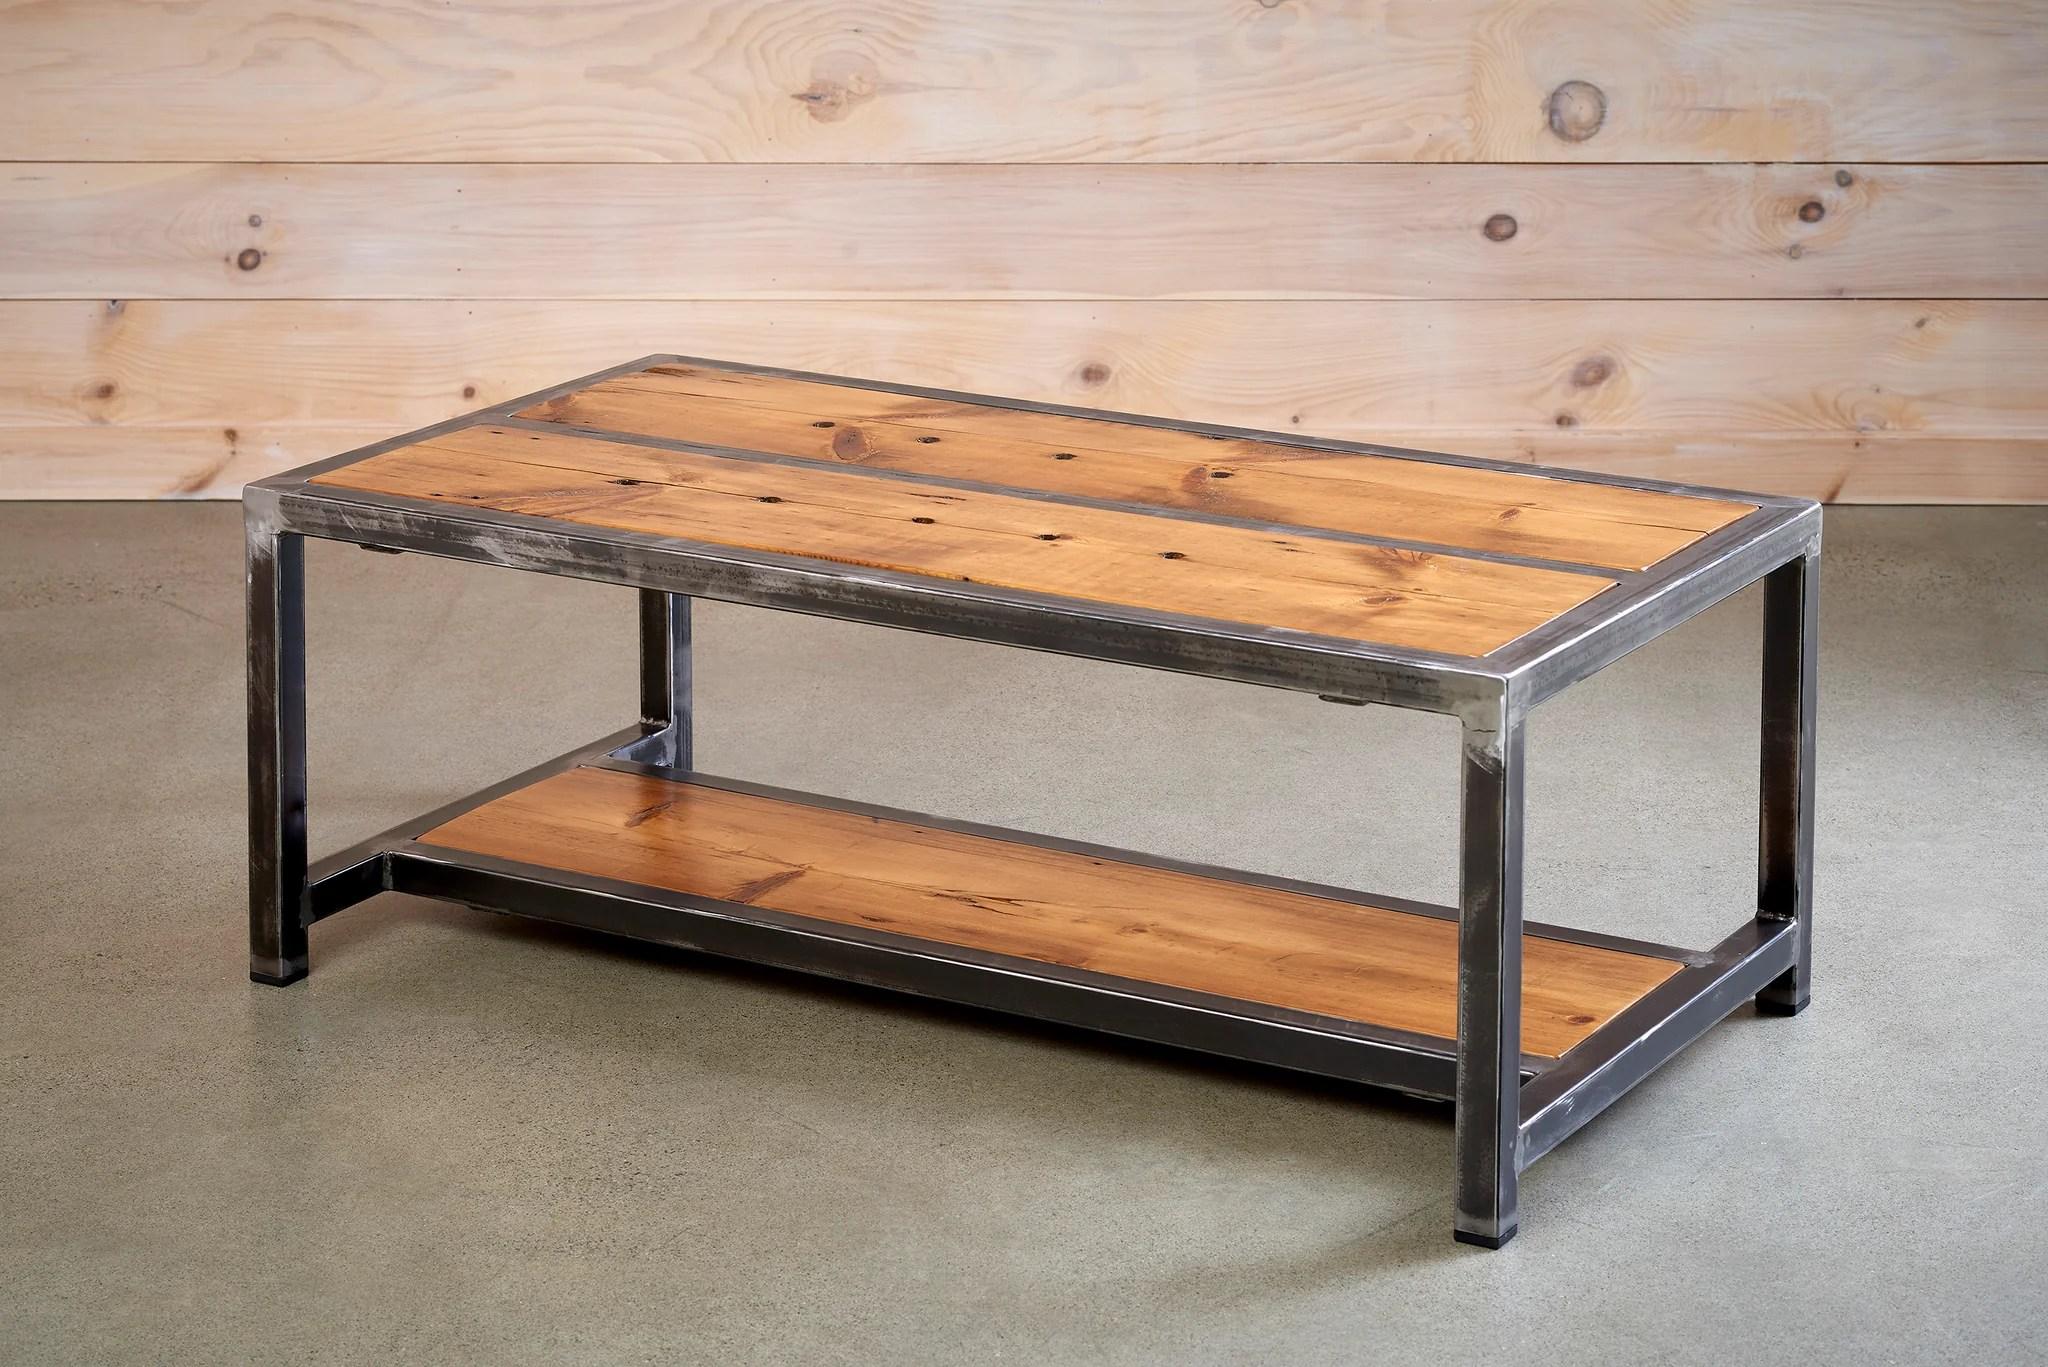 https wood dining web app wood table metal html